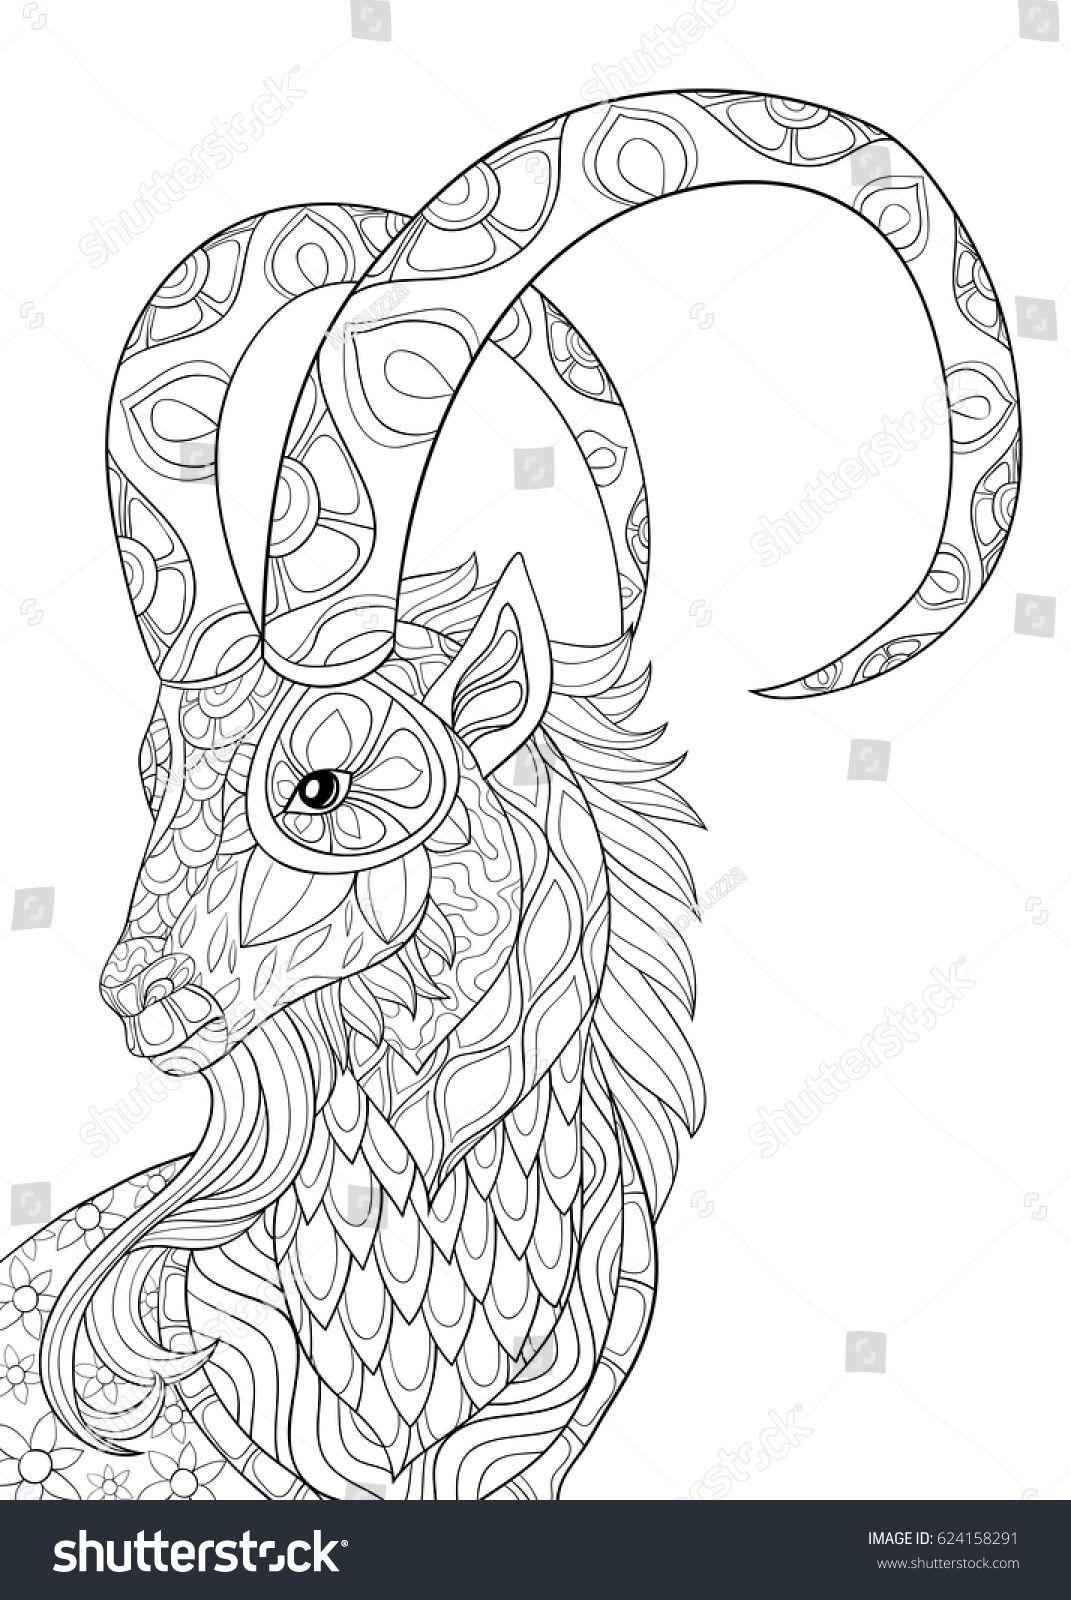 Adult Coloring Page Goat Zen Art Style Illustration